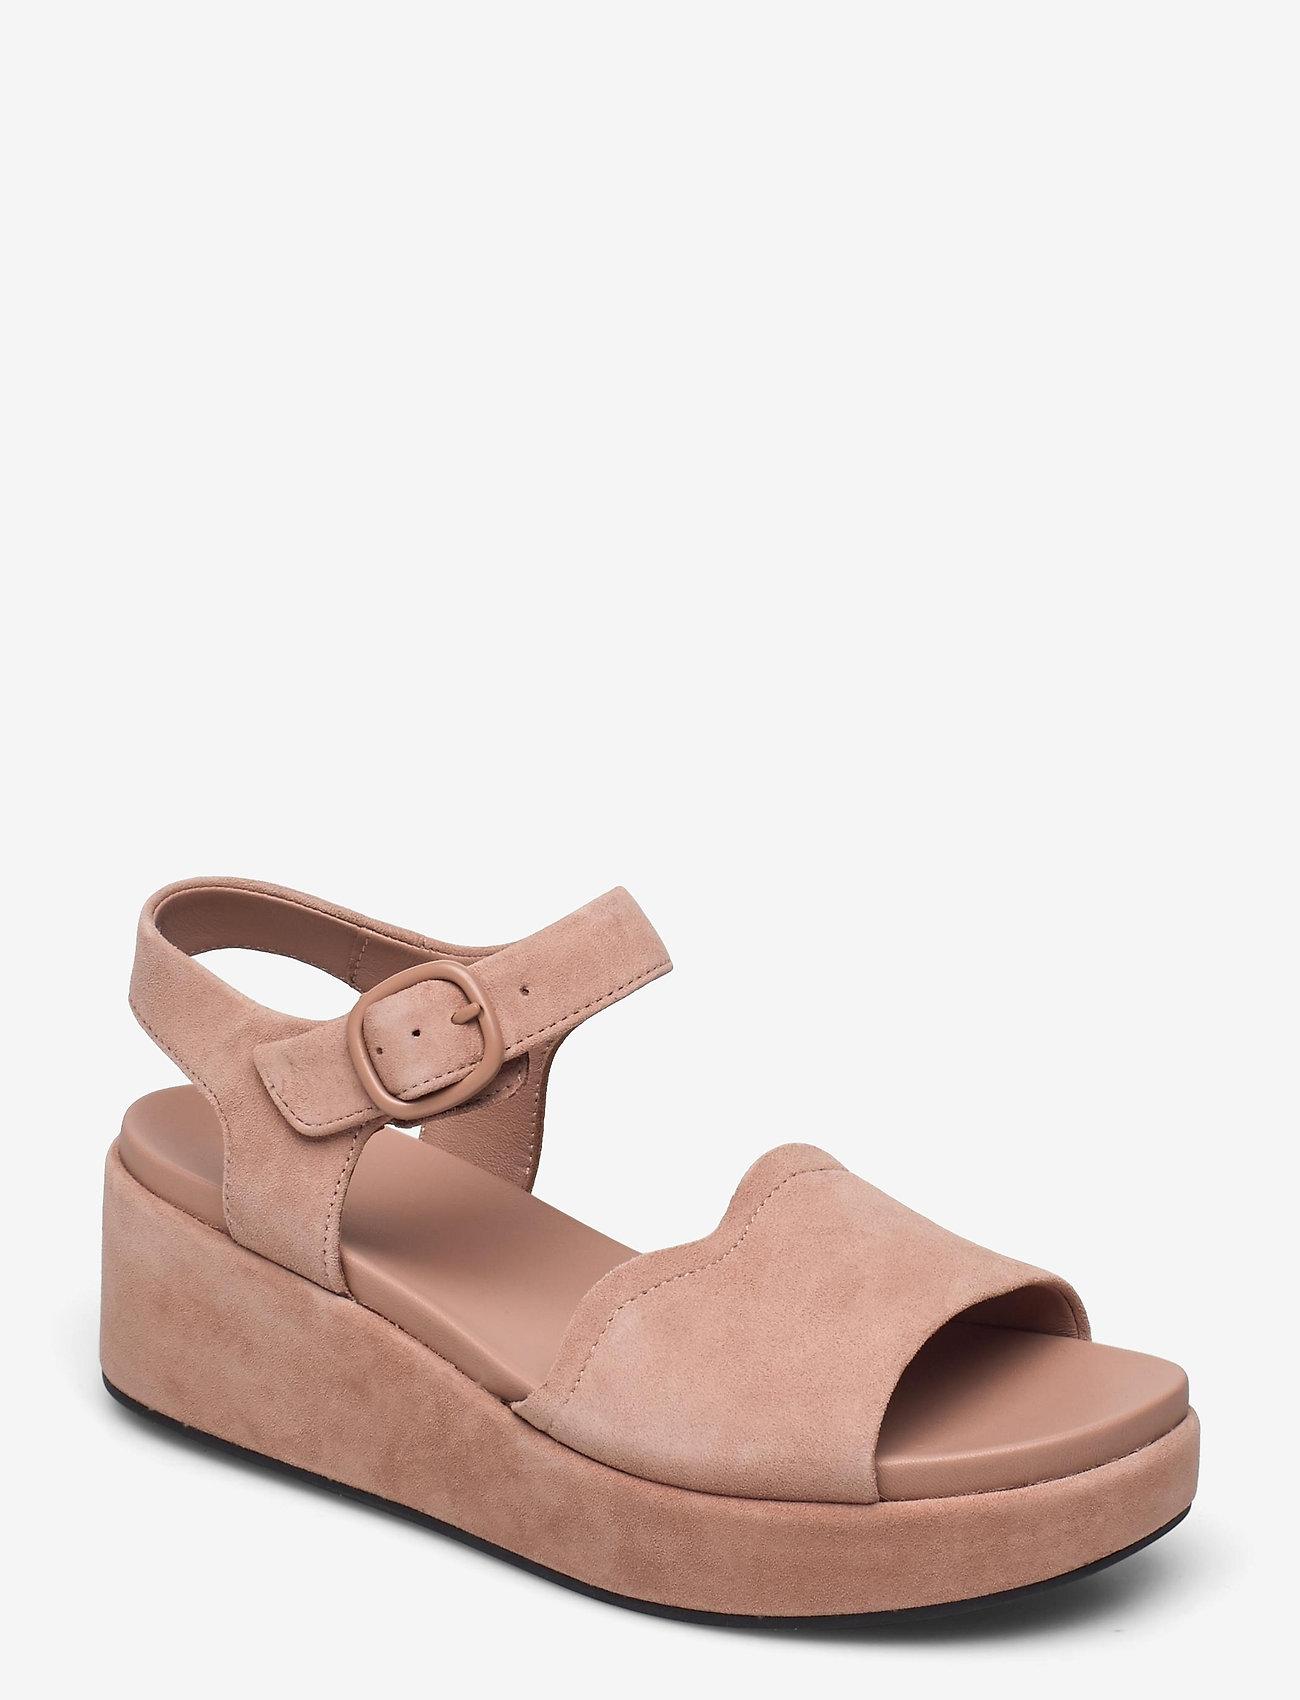 Clarks - Kimmei Way - platta sandaler - dark blush sde - 0